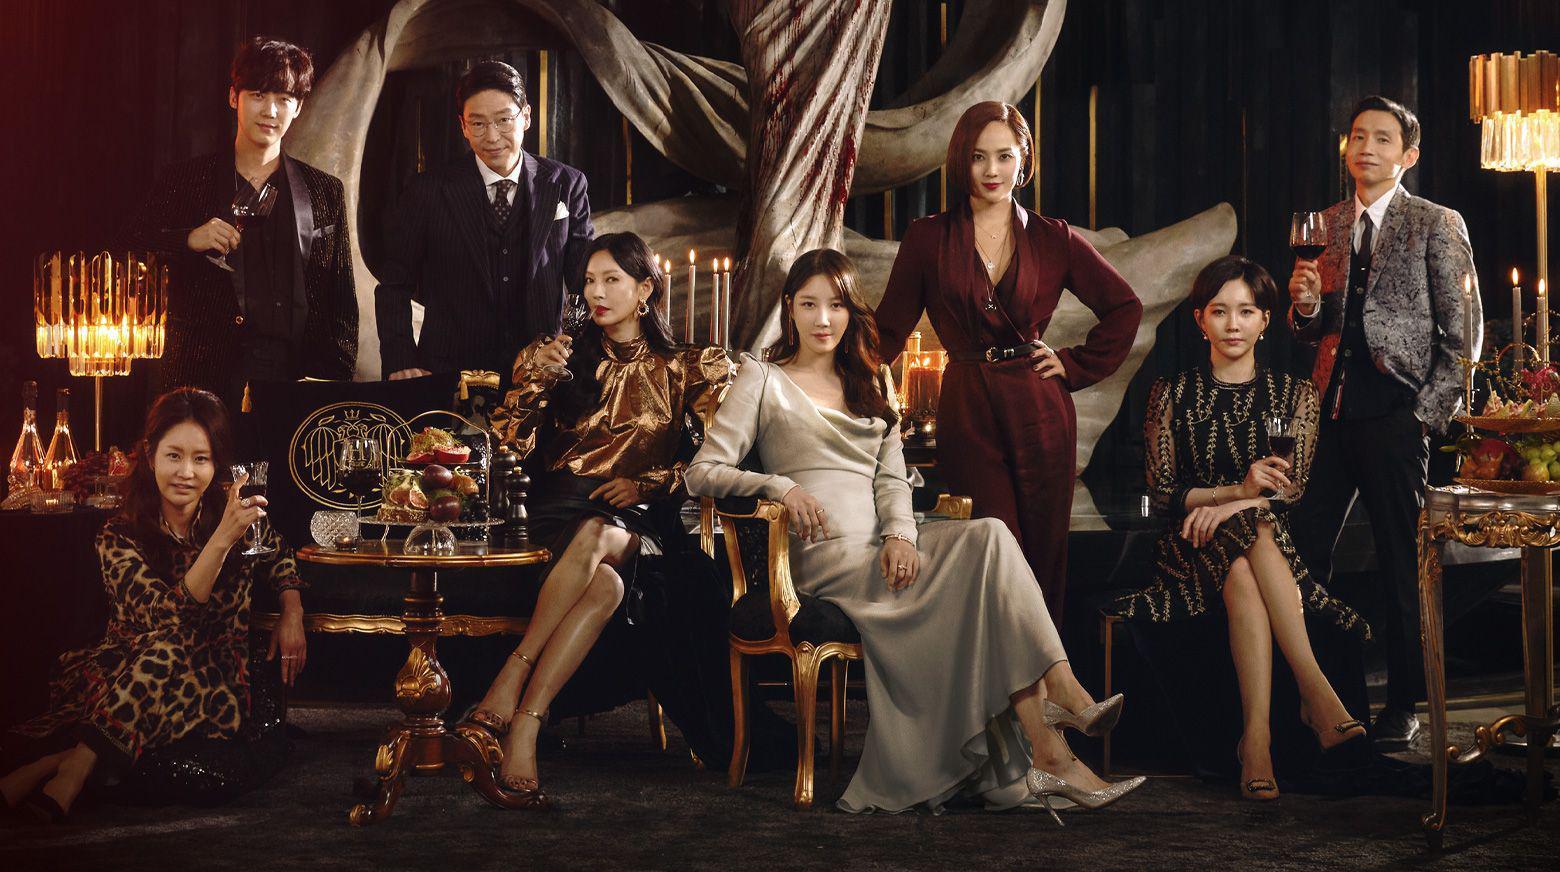 The Penthouse Season 4 Release Date, Recap, Spoilers, Watch Online